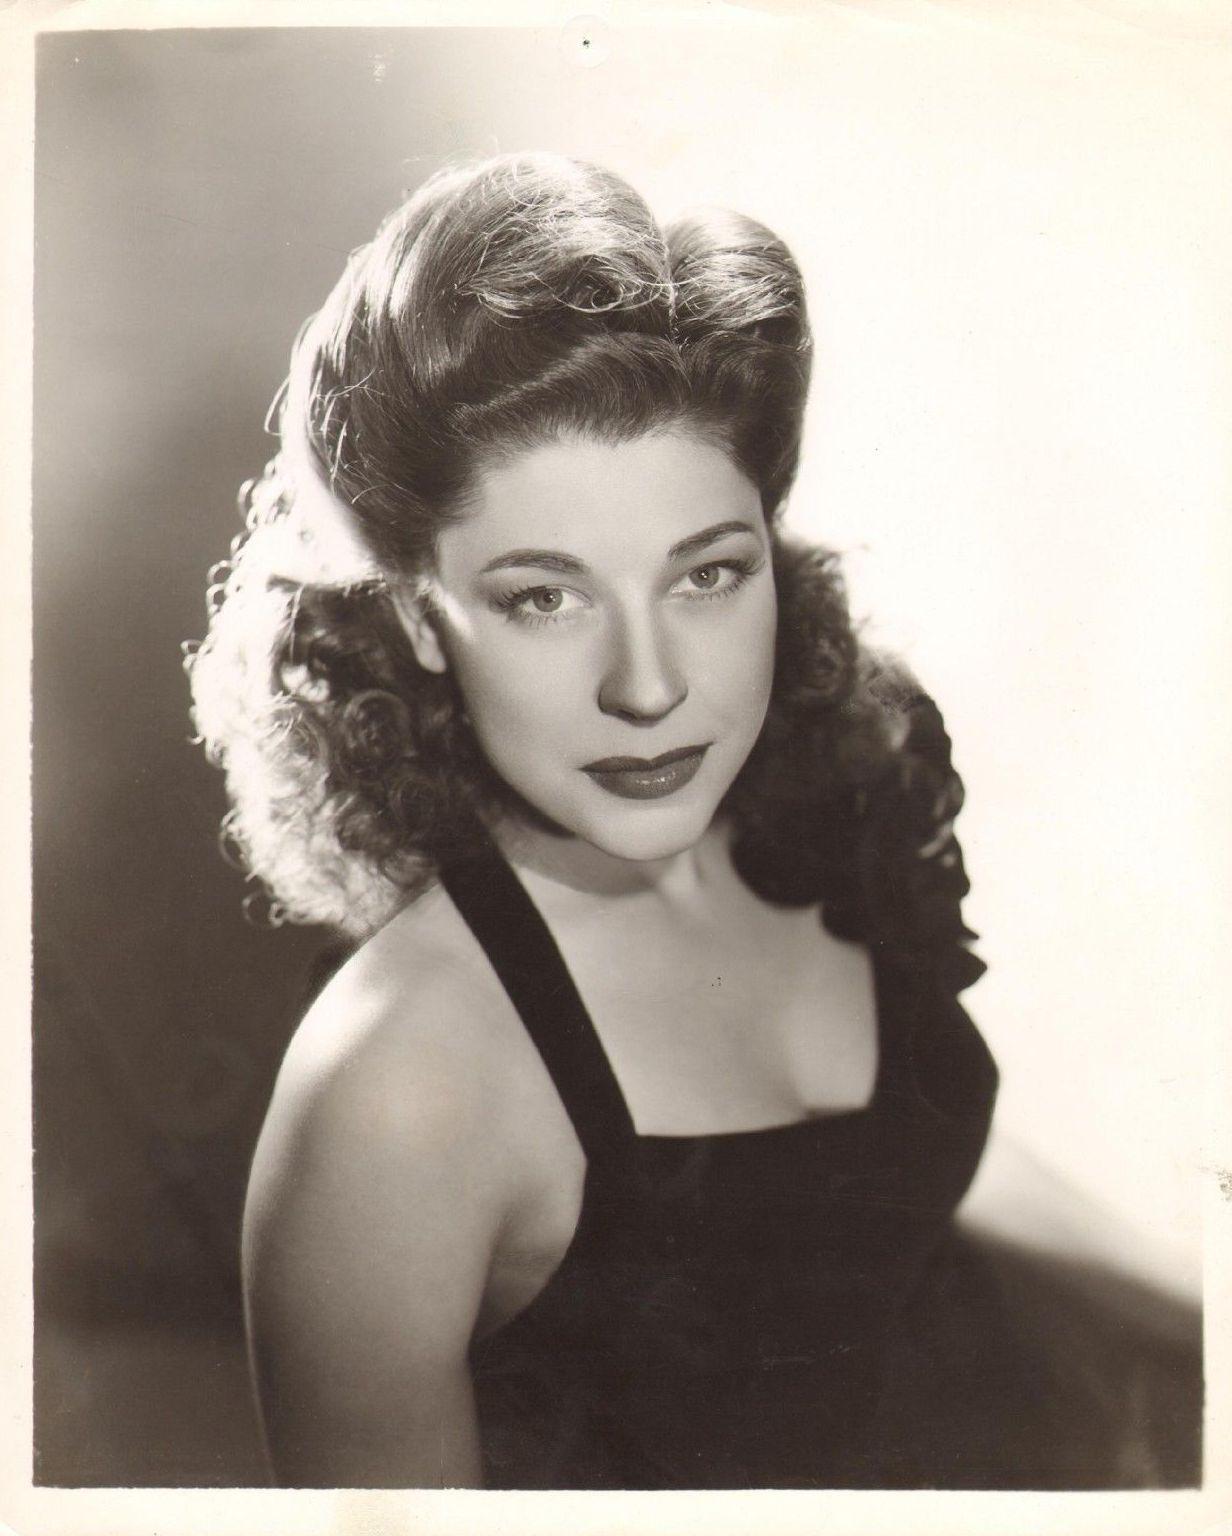 Jane White images